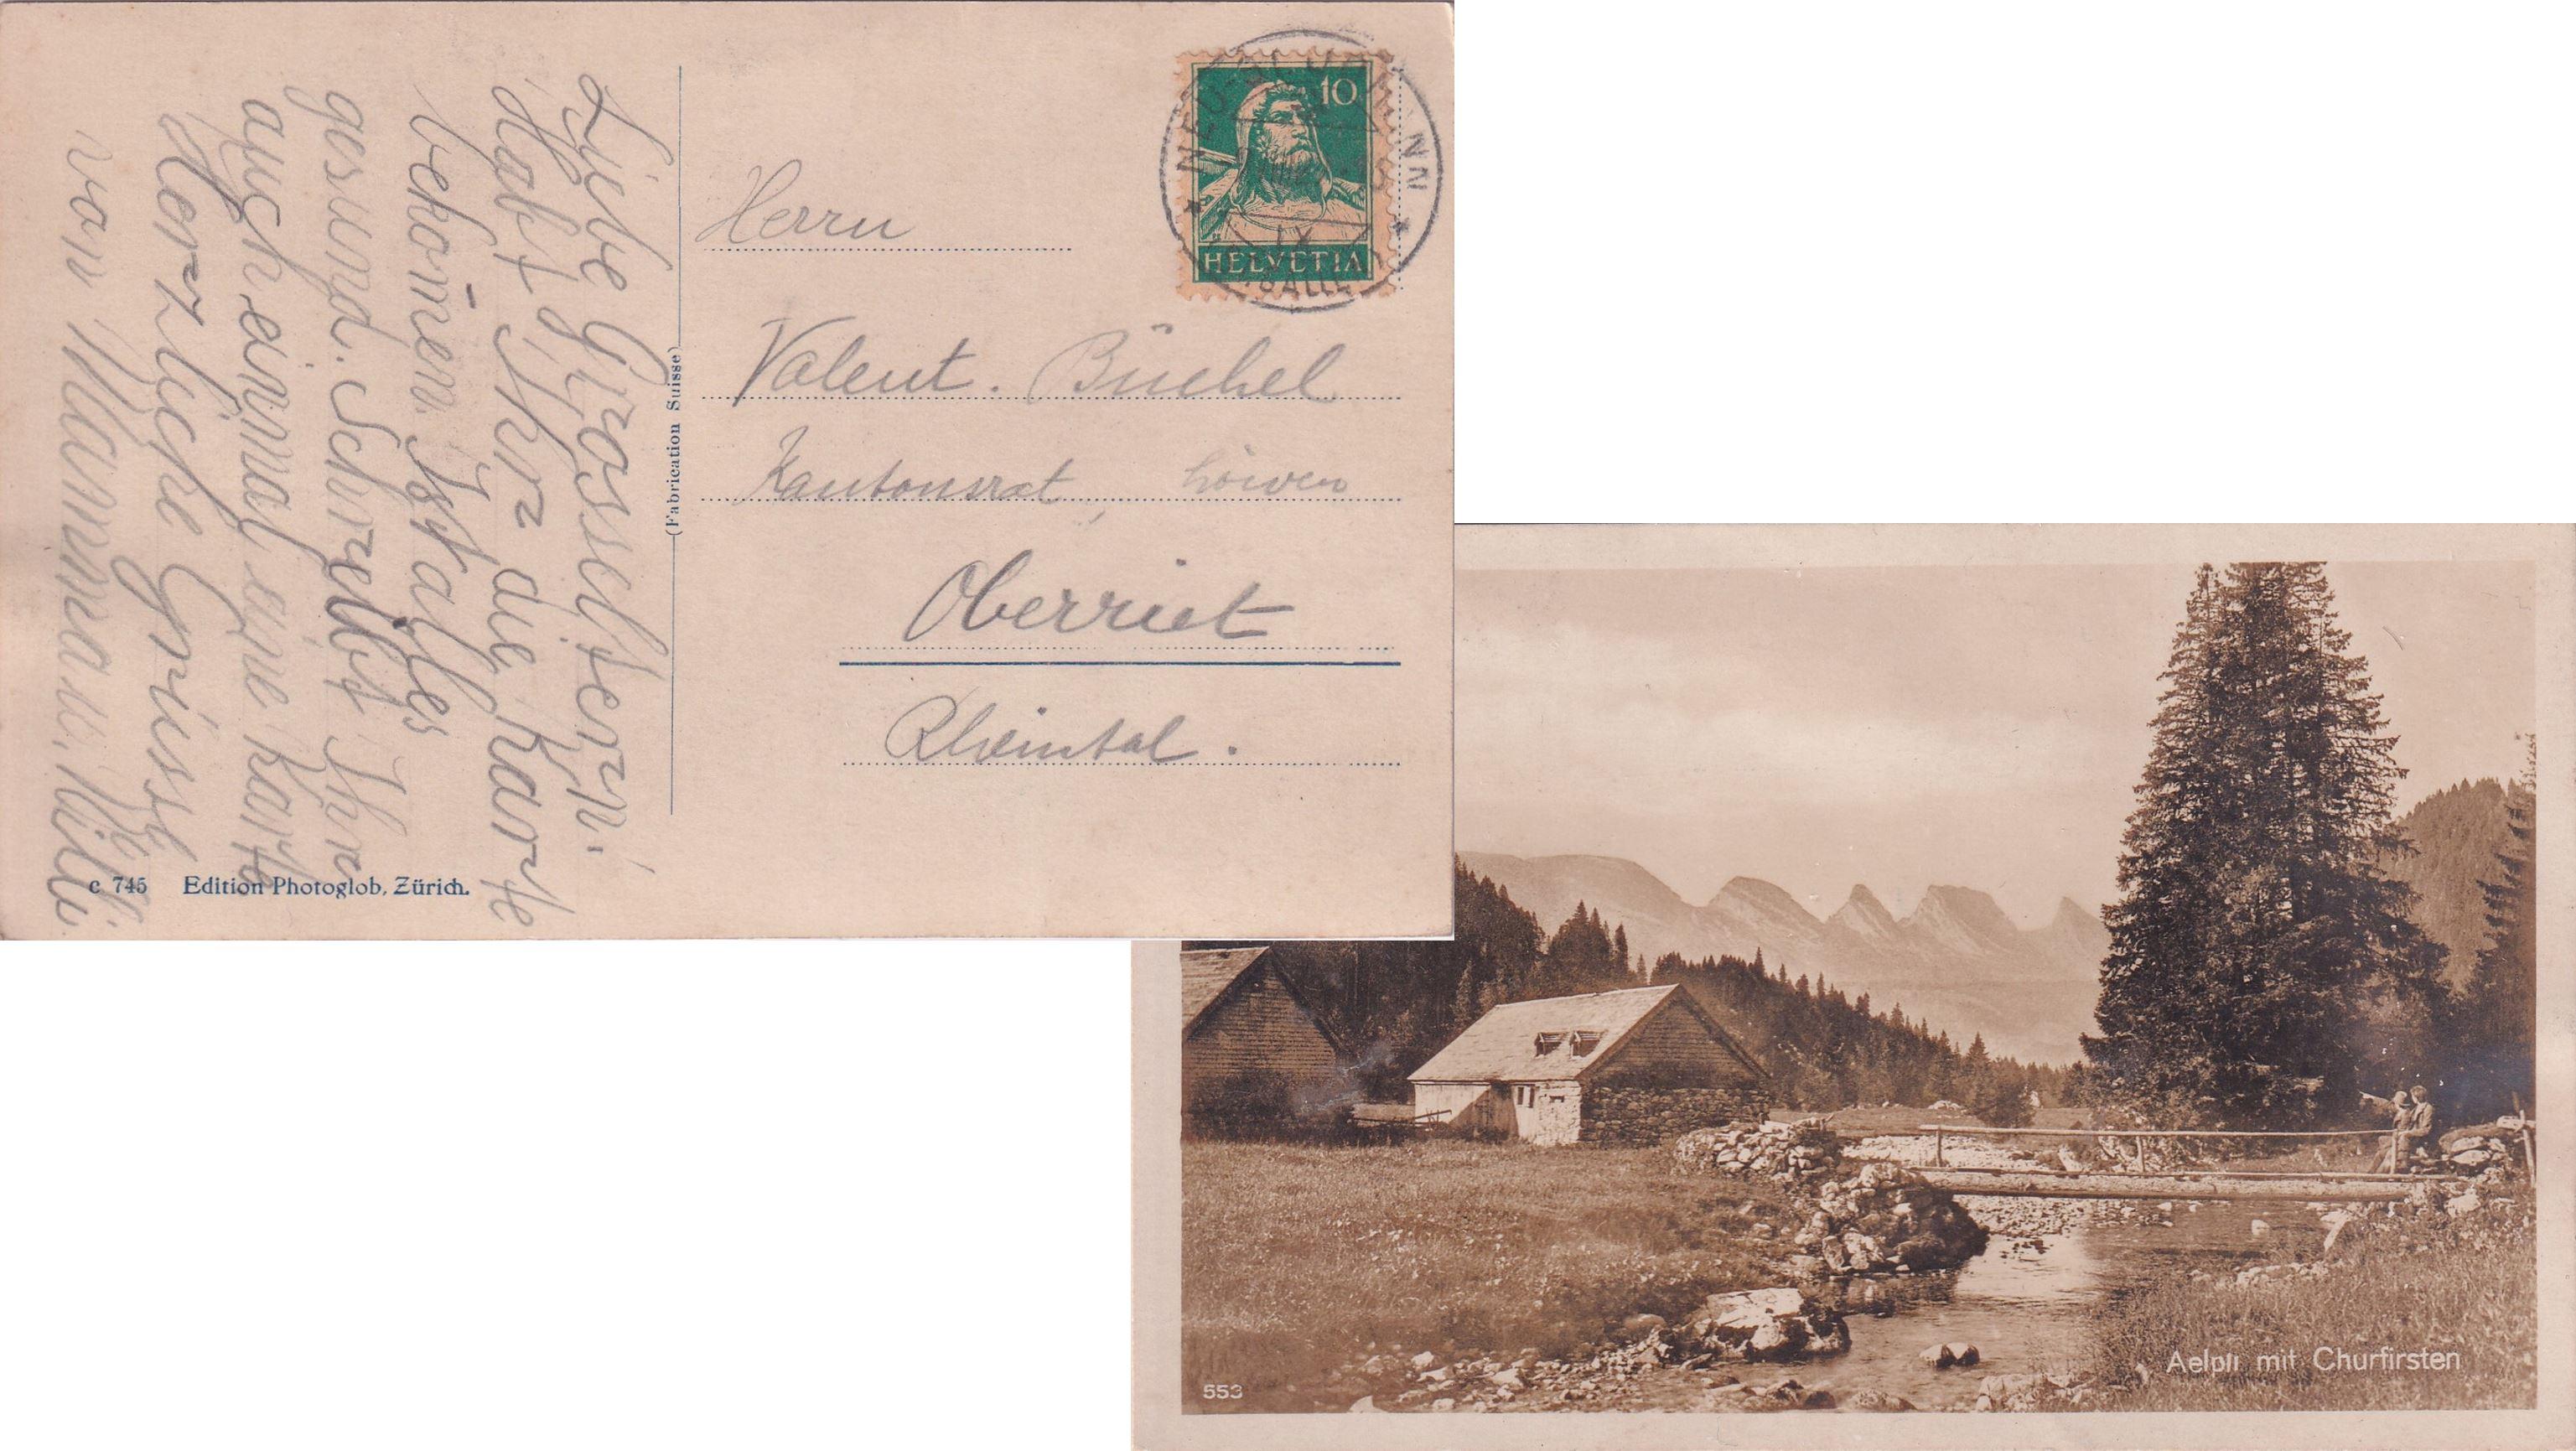 Valentin Büchel (1868-1949)